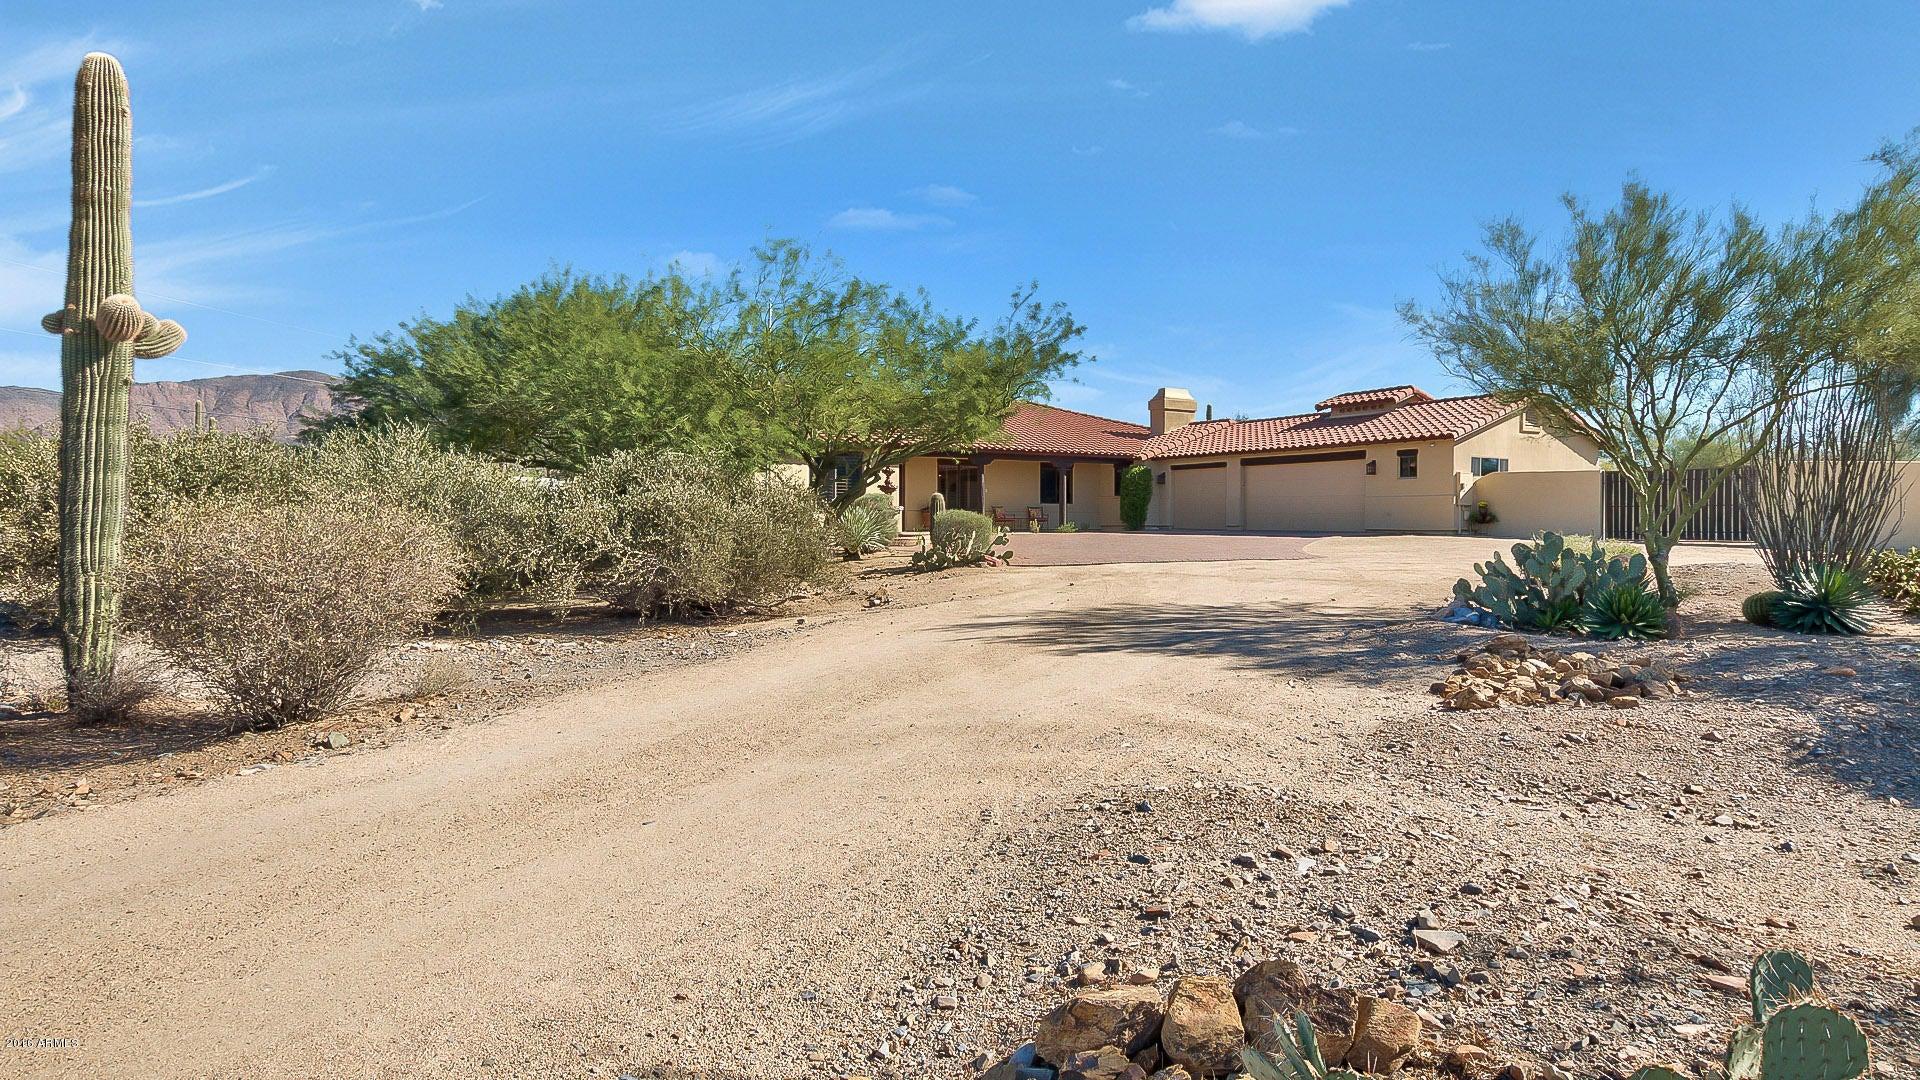 40195 N 70th Street, Cave Creek AZ 85331